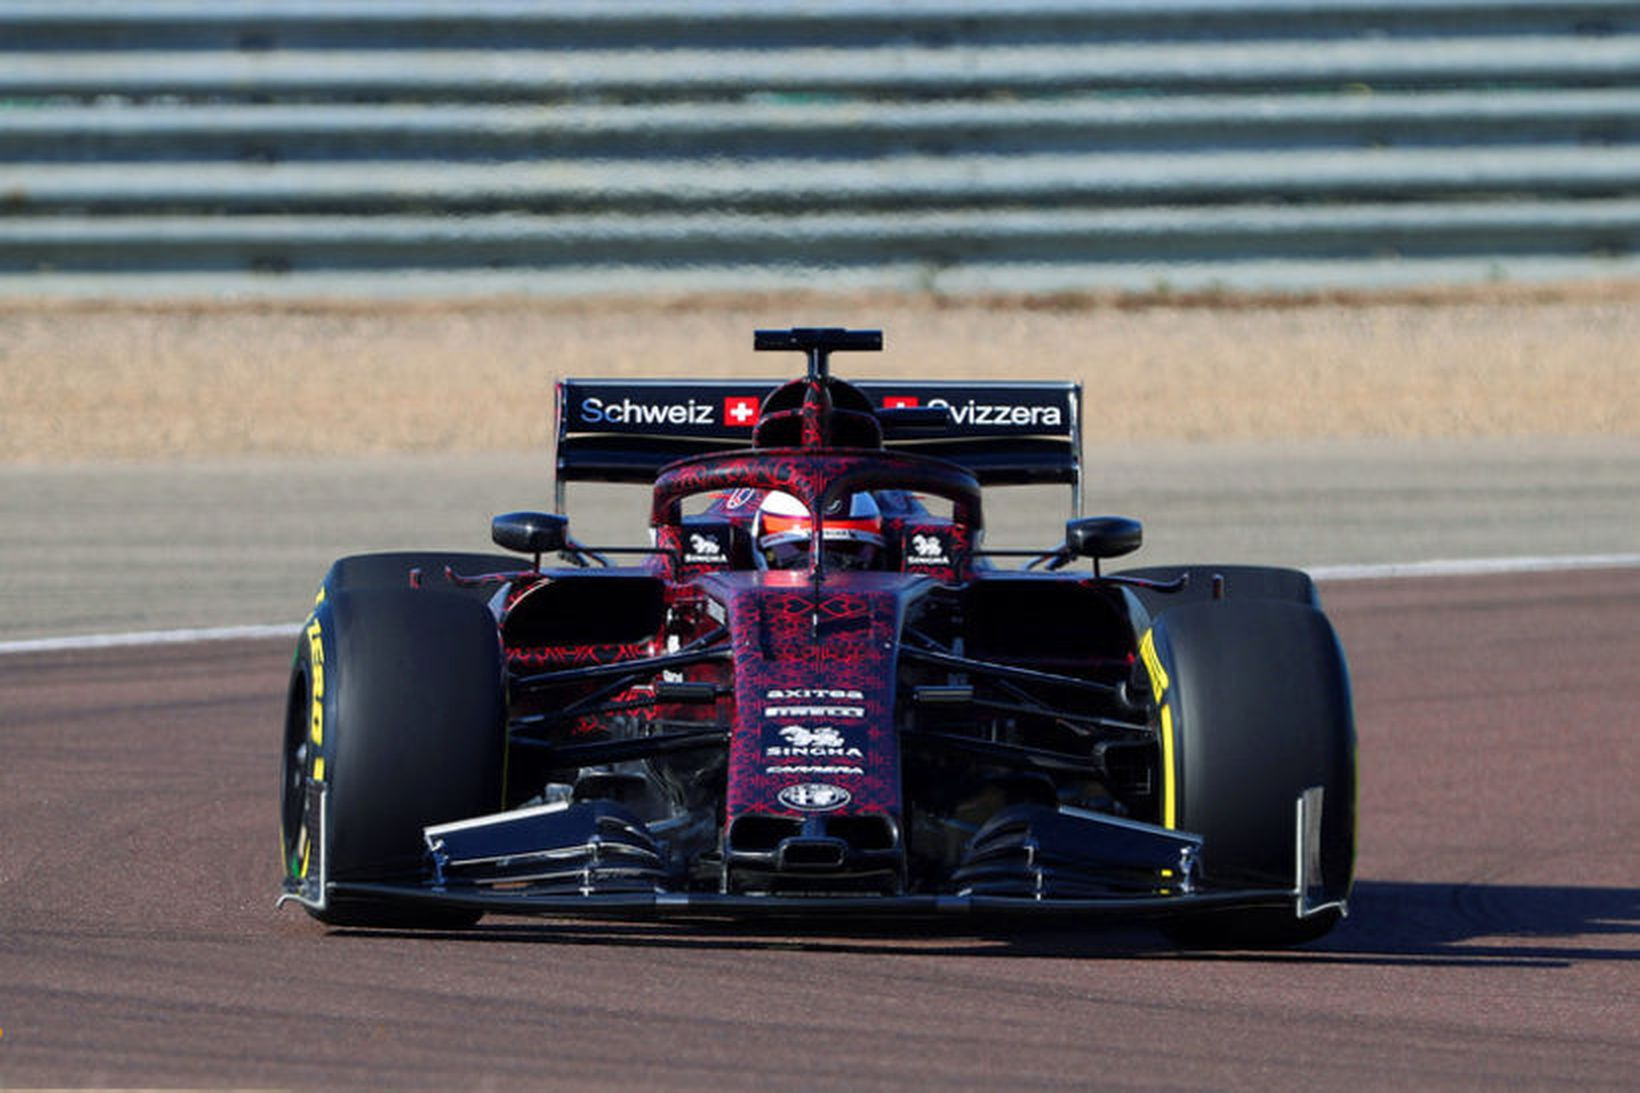 Kimi Räikkönen frumekur Alfa Romeo Sauber í Fiorano í dag. …